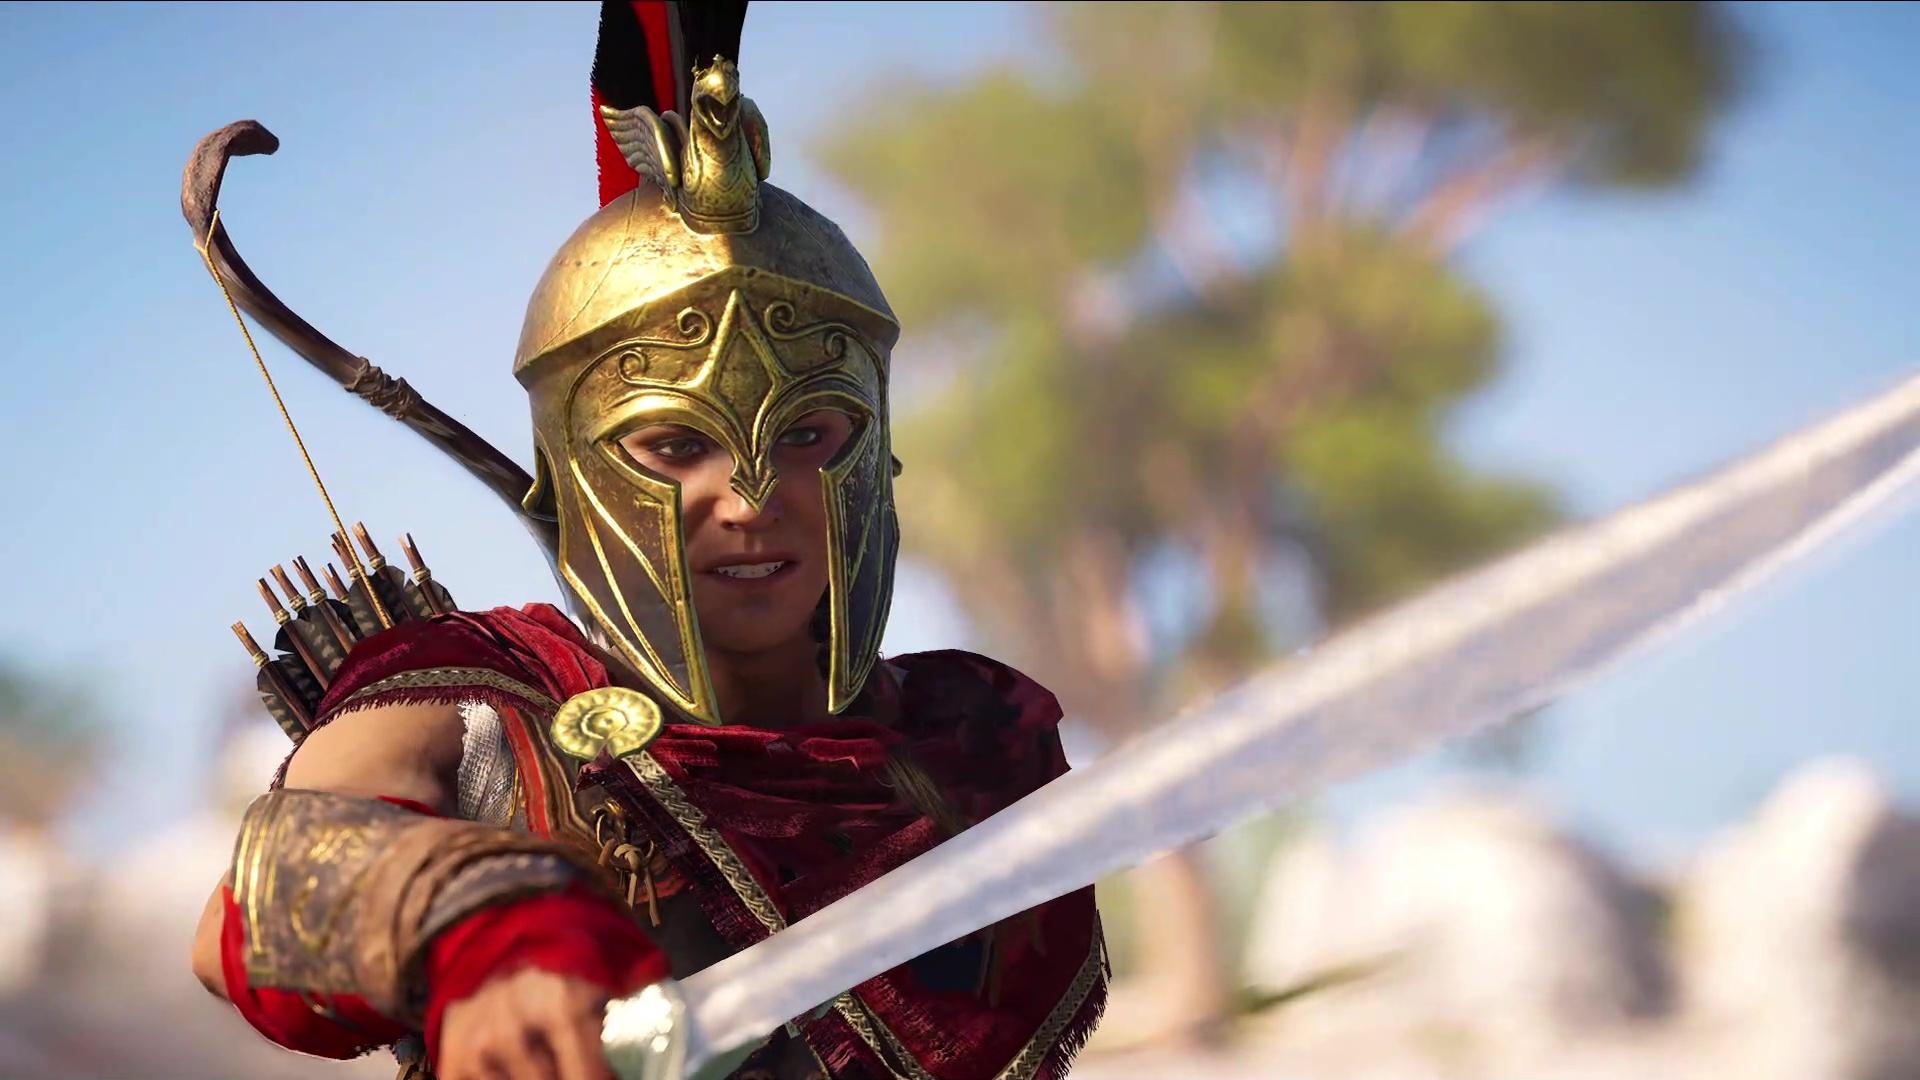 Assassin's Creed Odyssey - Kassandra holding her sword